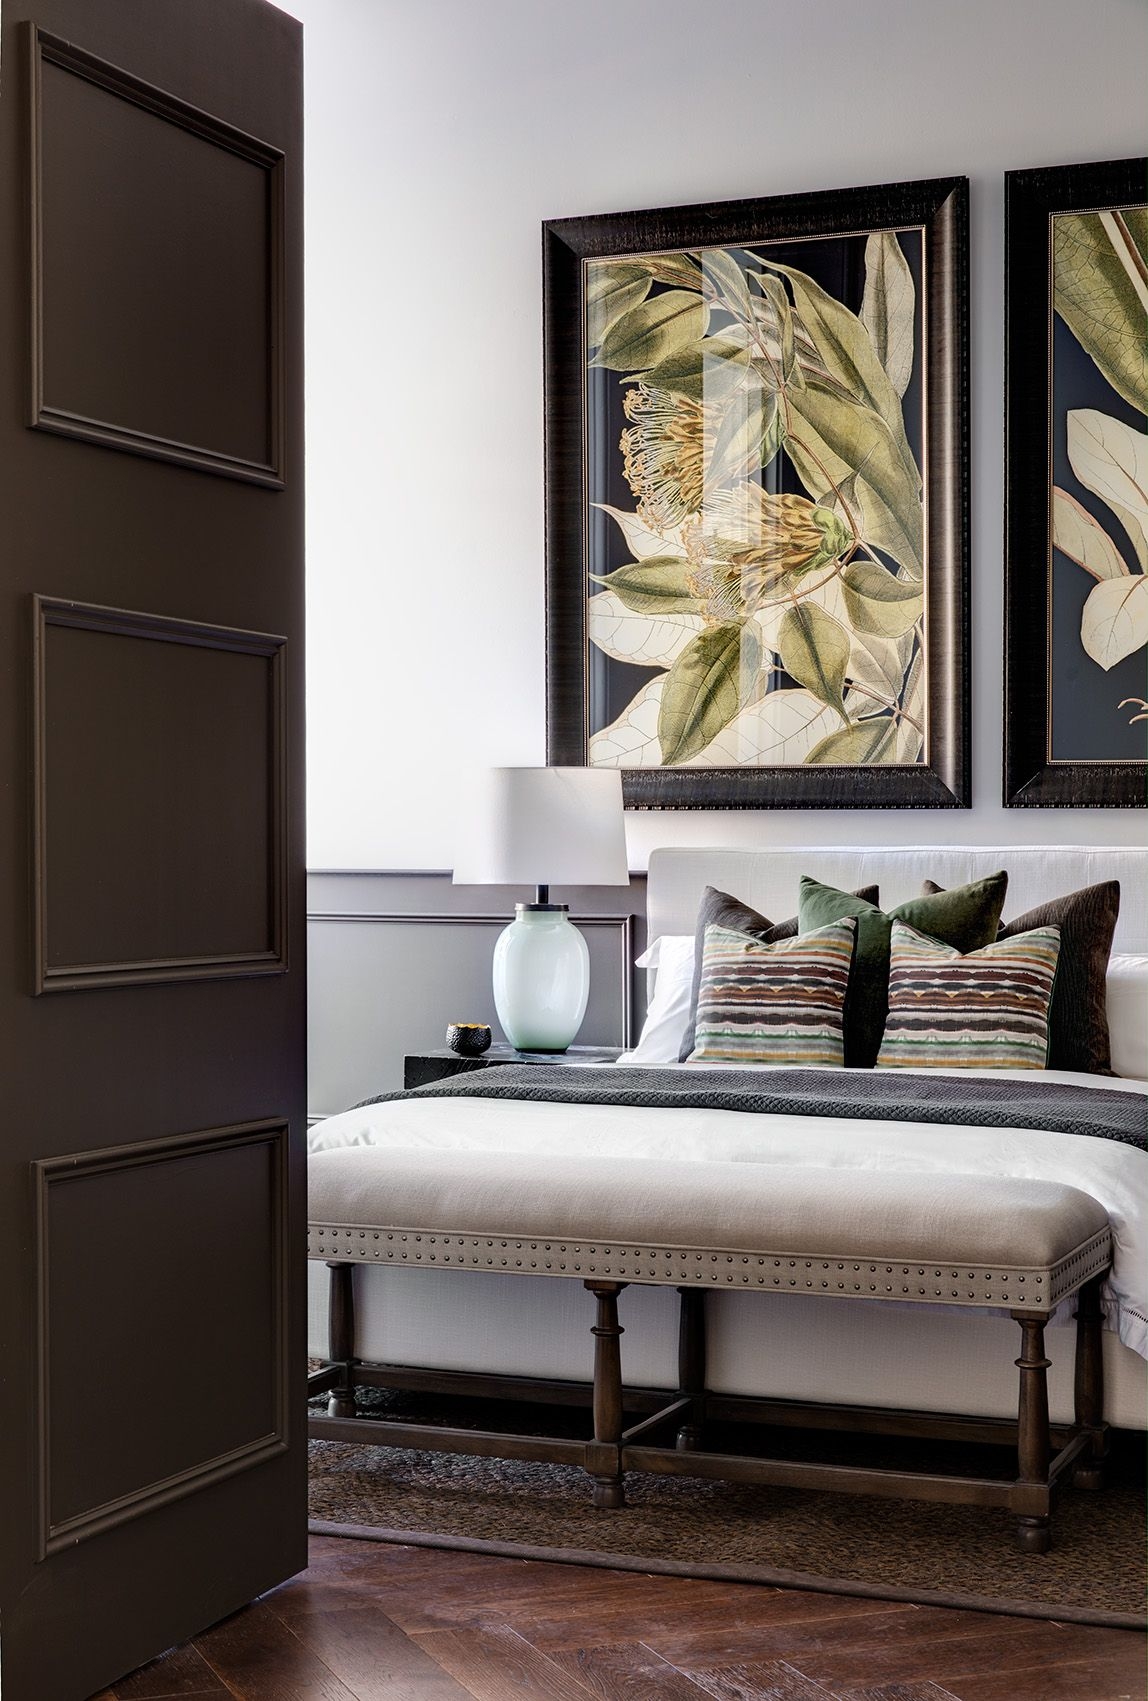 Coco Republic Discreetly Elegant Furniture U0026 Stylish Homewares. Property  Styling And Interior Design Services